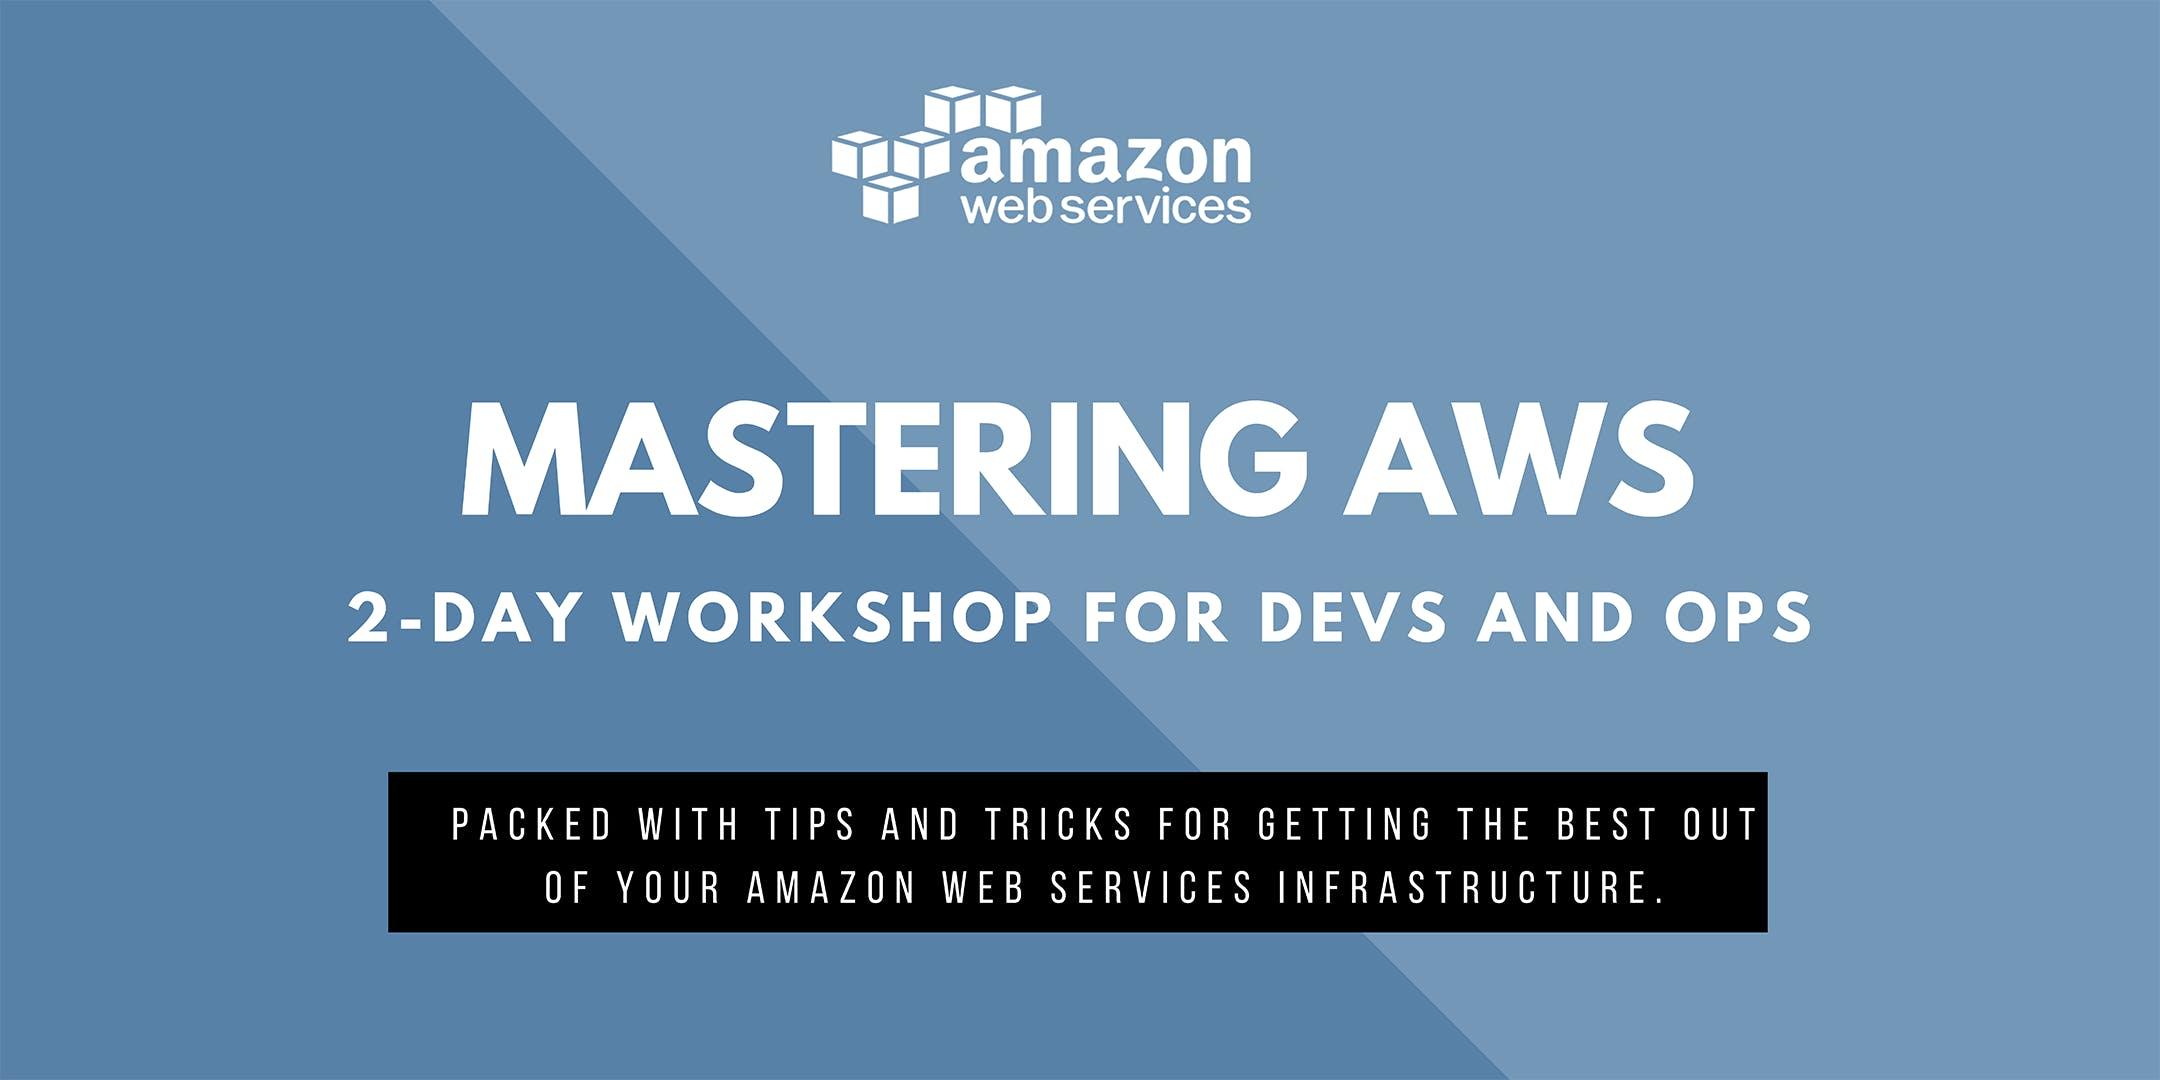 TOP Mastering Amazon Web Services (Cork)